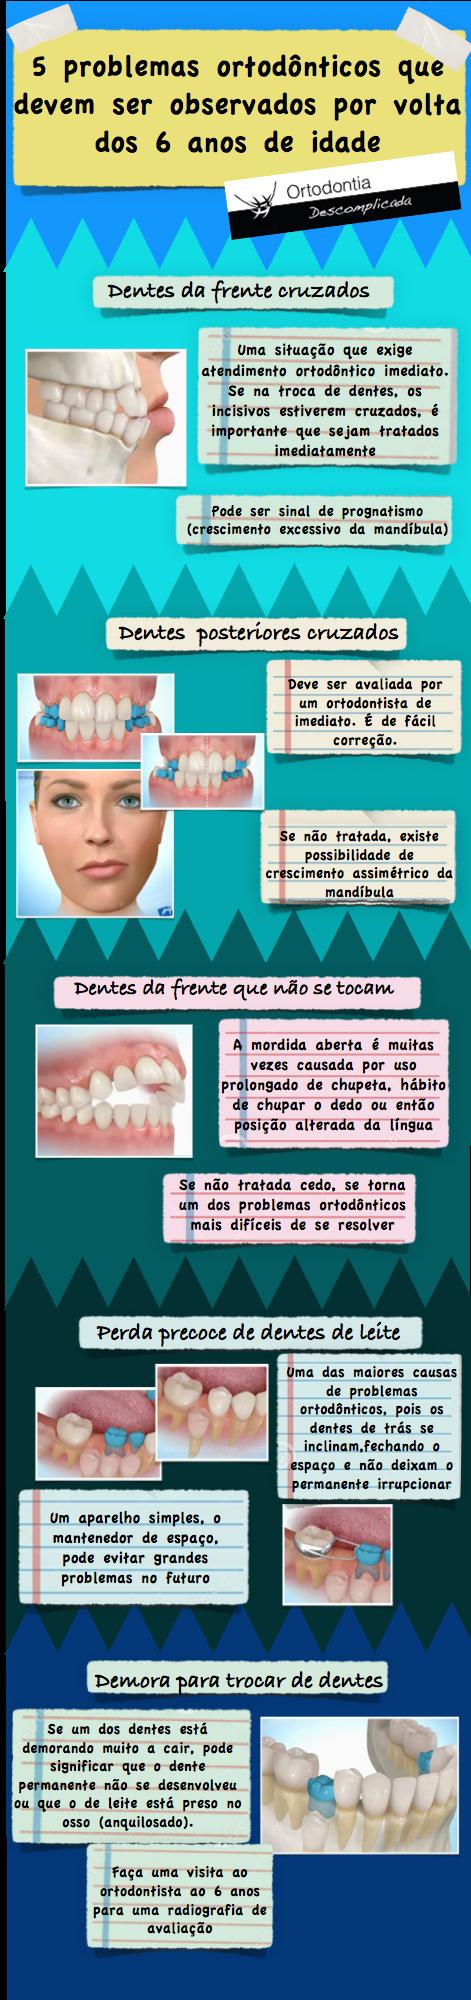 infografico-5-problemas-ortodonticos-por-volta-dos-5-anos-de-idade